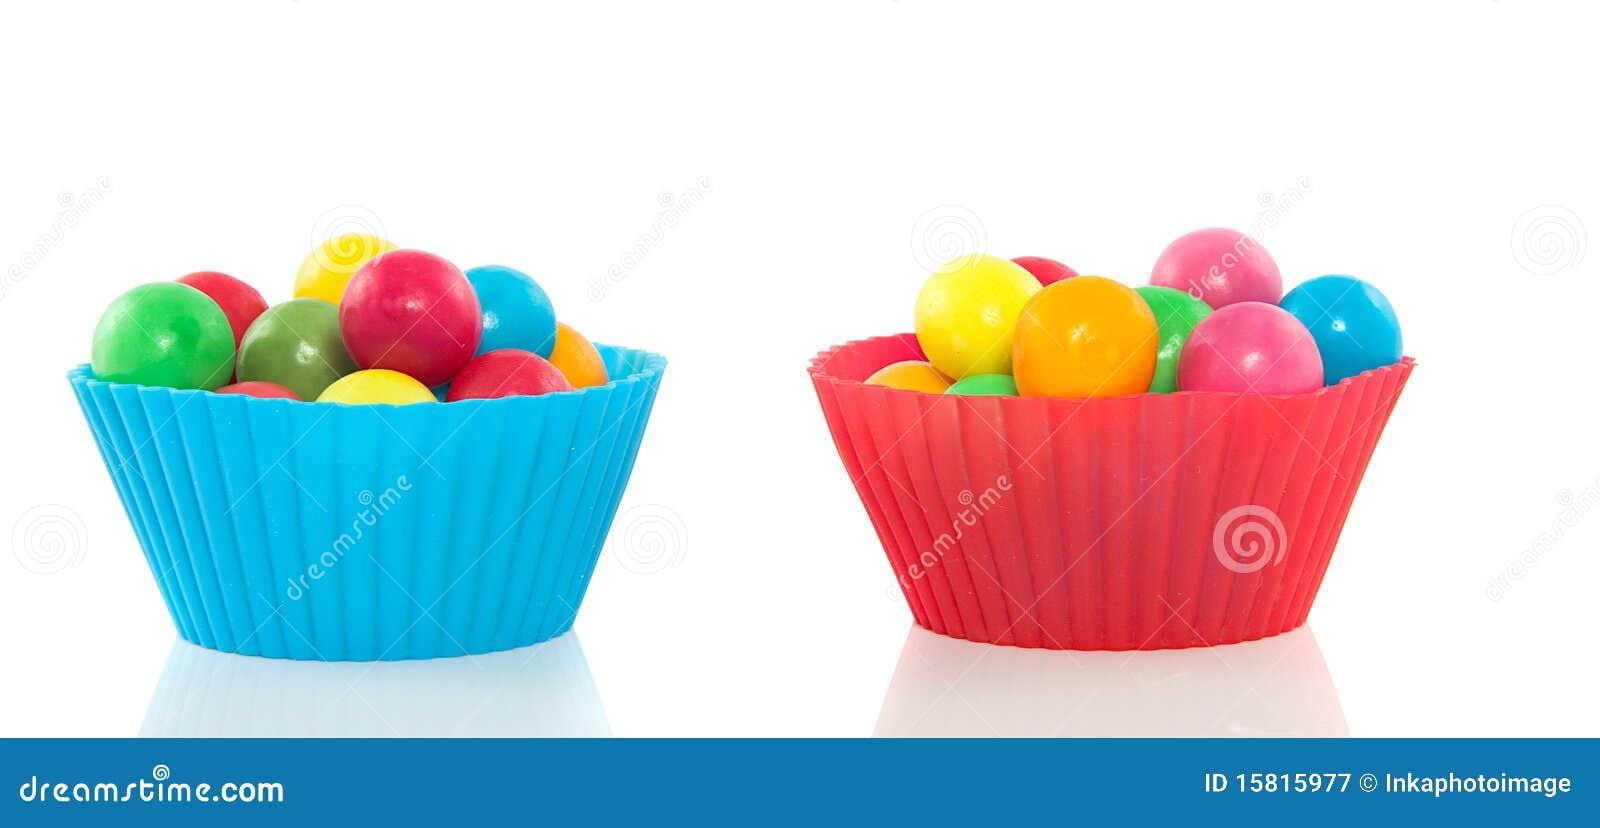 Gumballs dulces coloridos